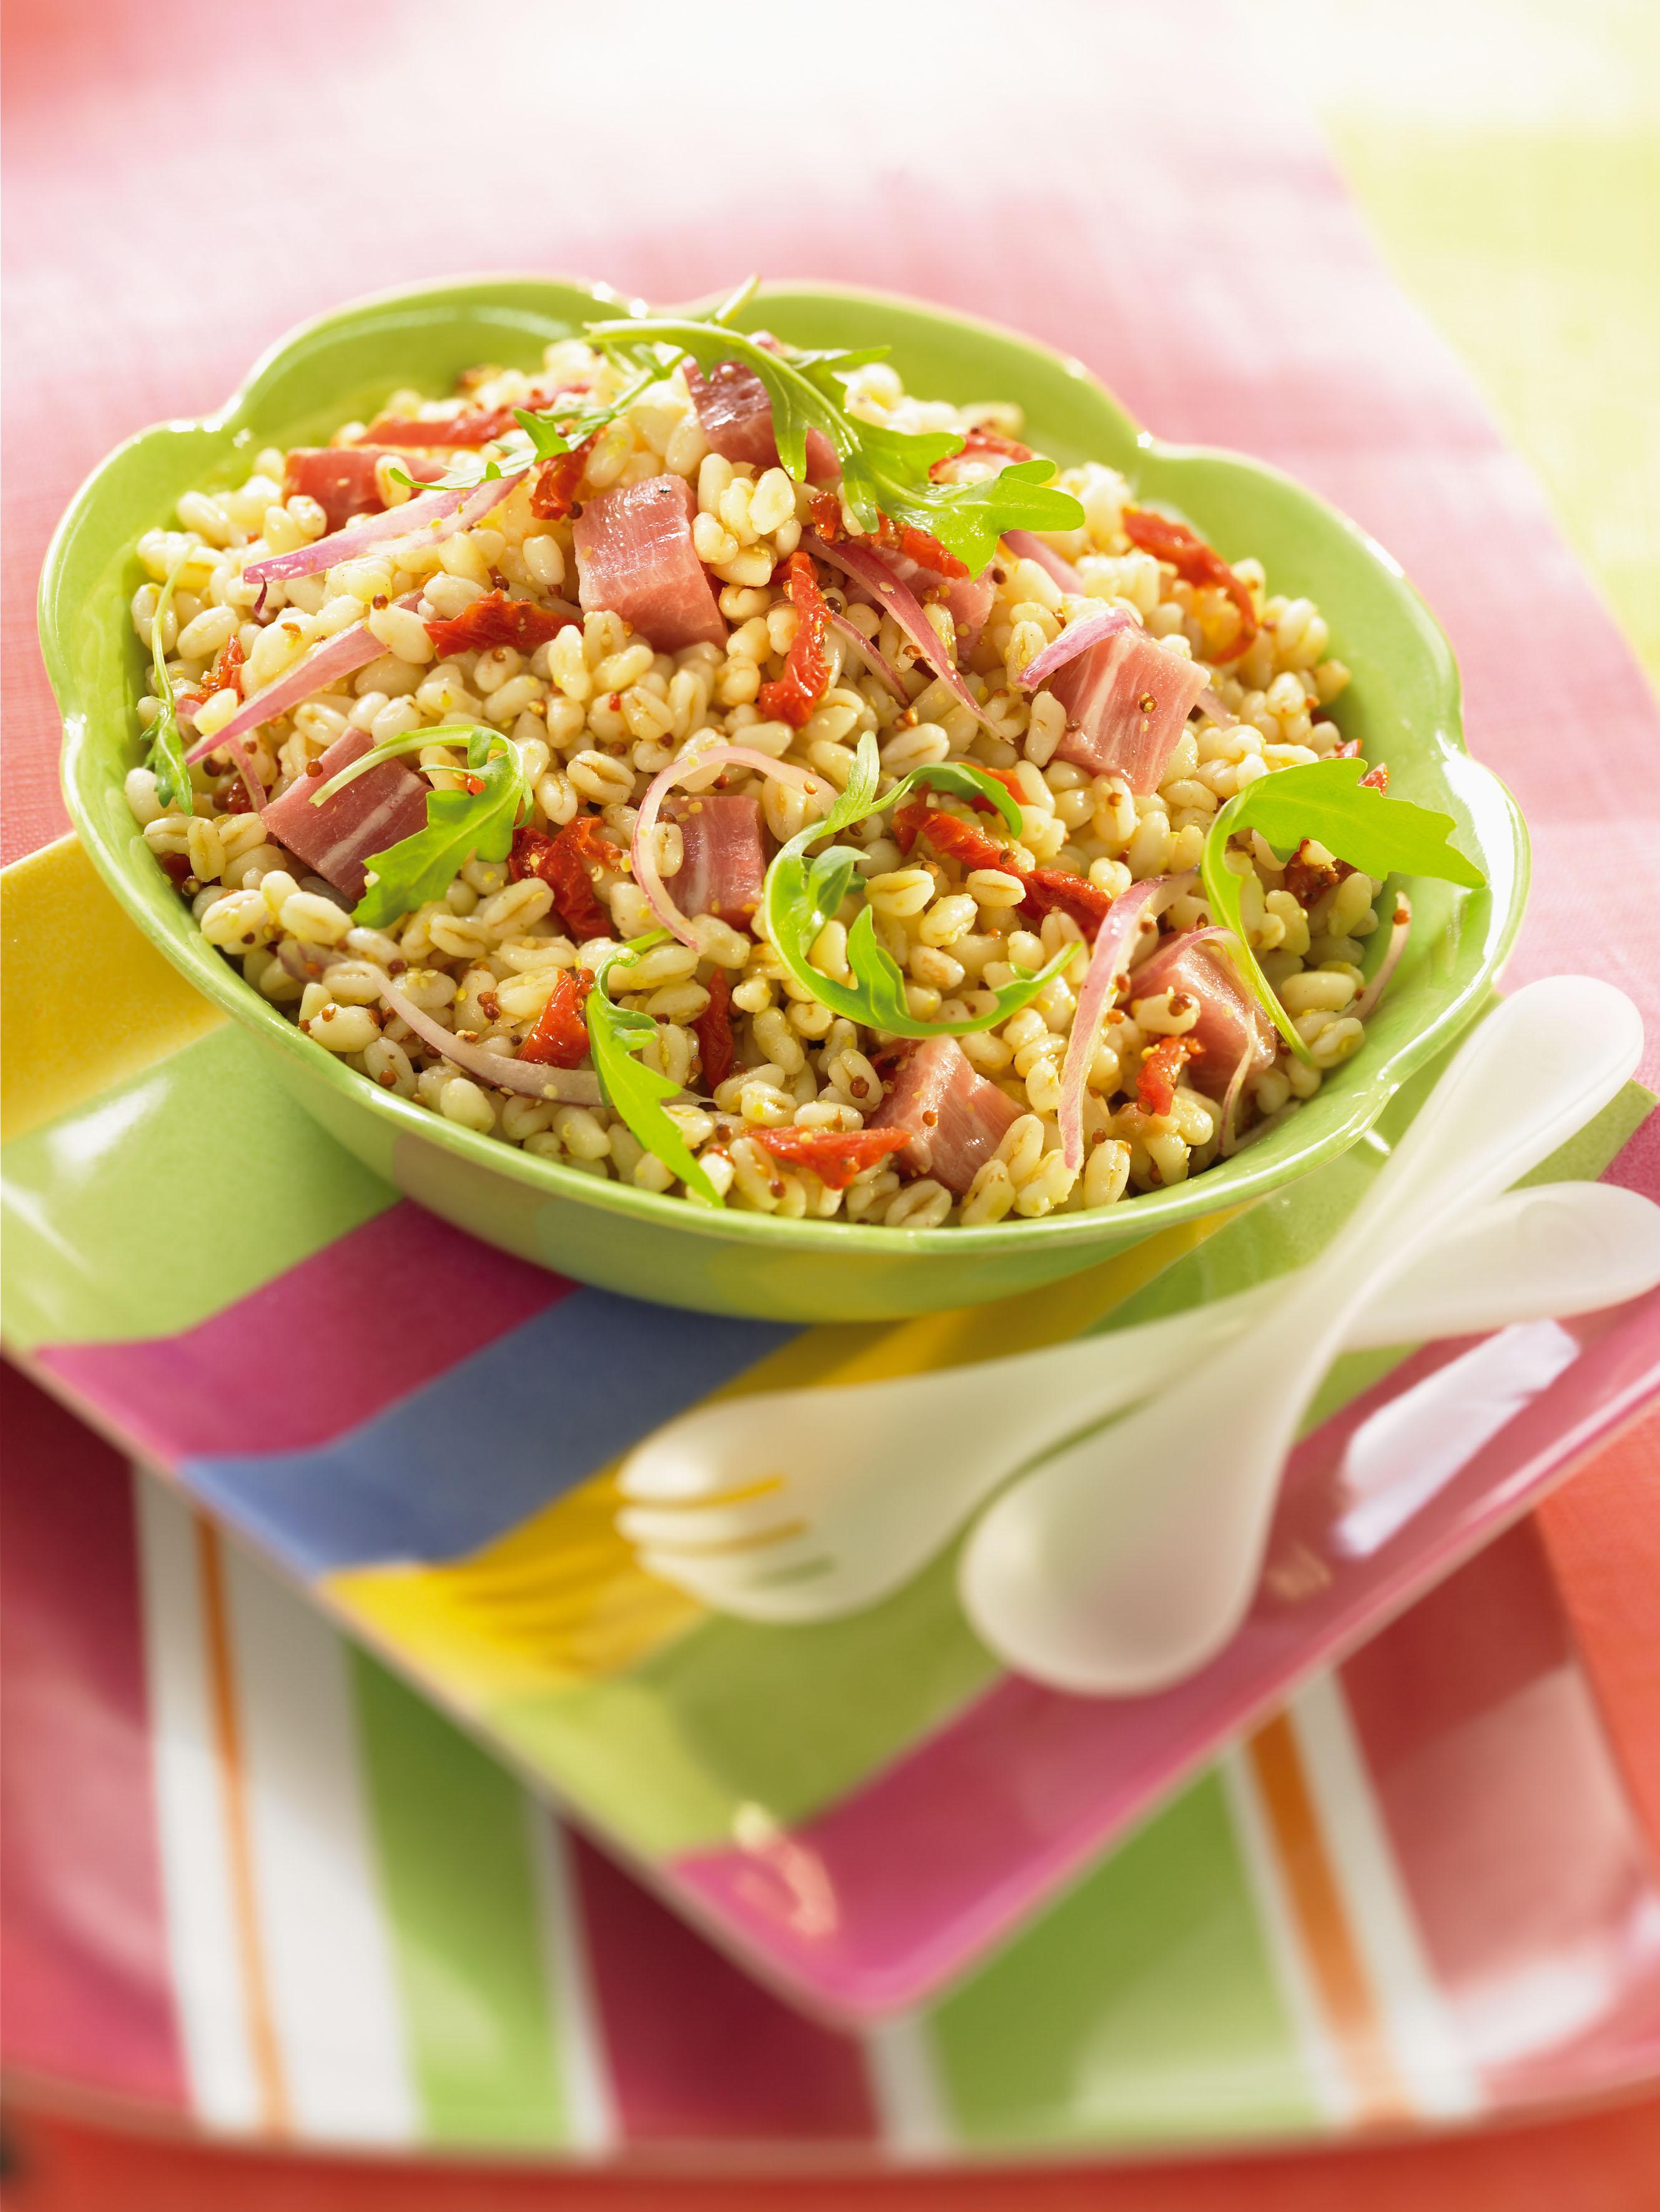 youmiam recipe salade de bl ebly la moutarde et au jambon fum. Black Bedroom Furniture Sets. Home Design Ideas